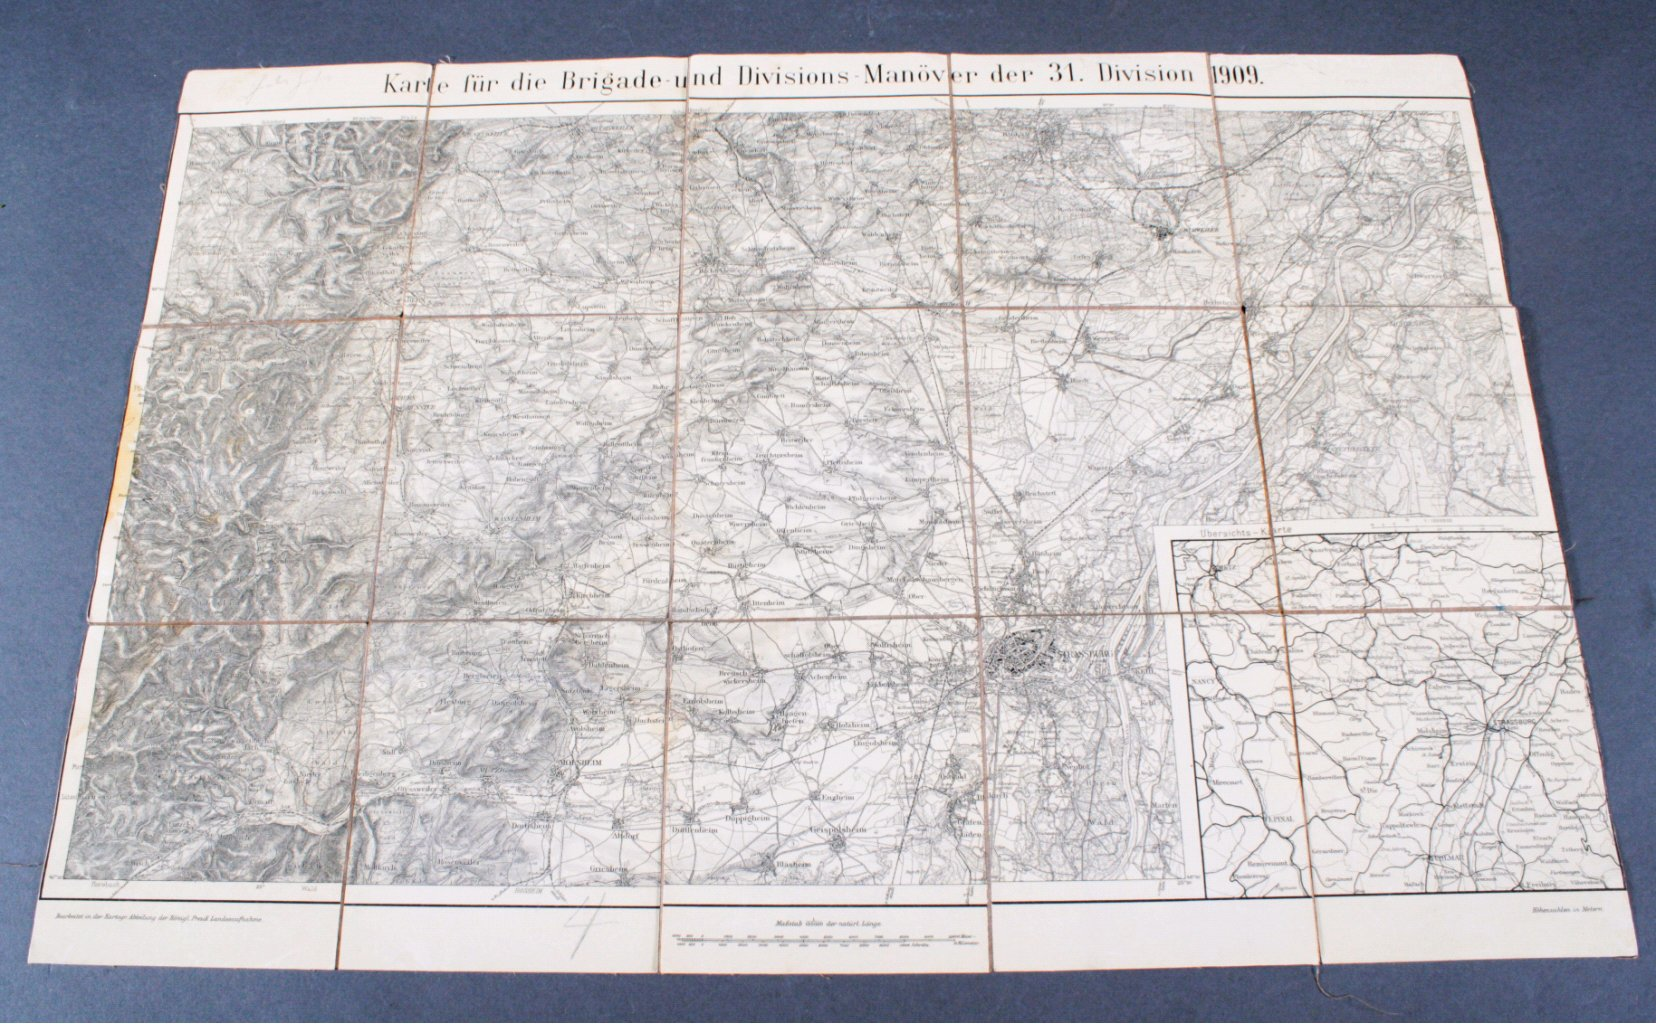 1909 Karte für MANÖVER der 31. DIVISION 1909